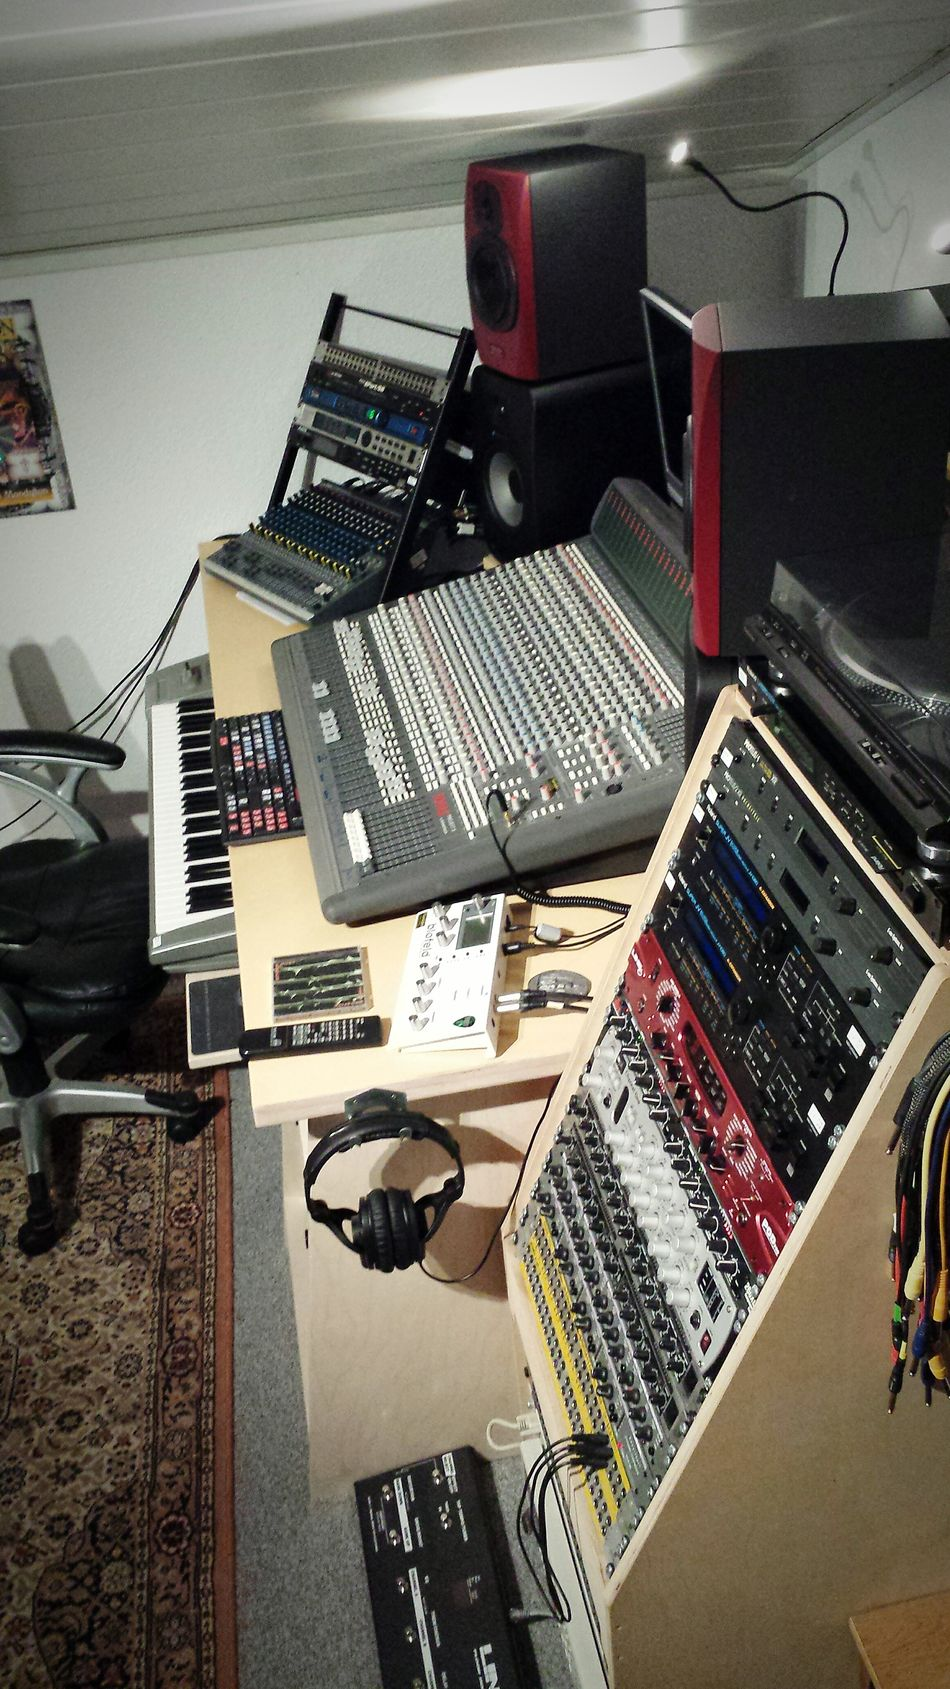 Tonstudio Musicstudio Mandylion Audio Mixer Mixer Tannoy Soundtracs Topaz8 Korgtrinity Gothicrock Www.mandylion.de